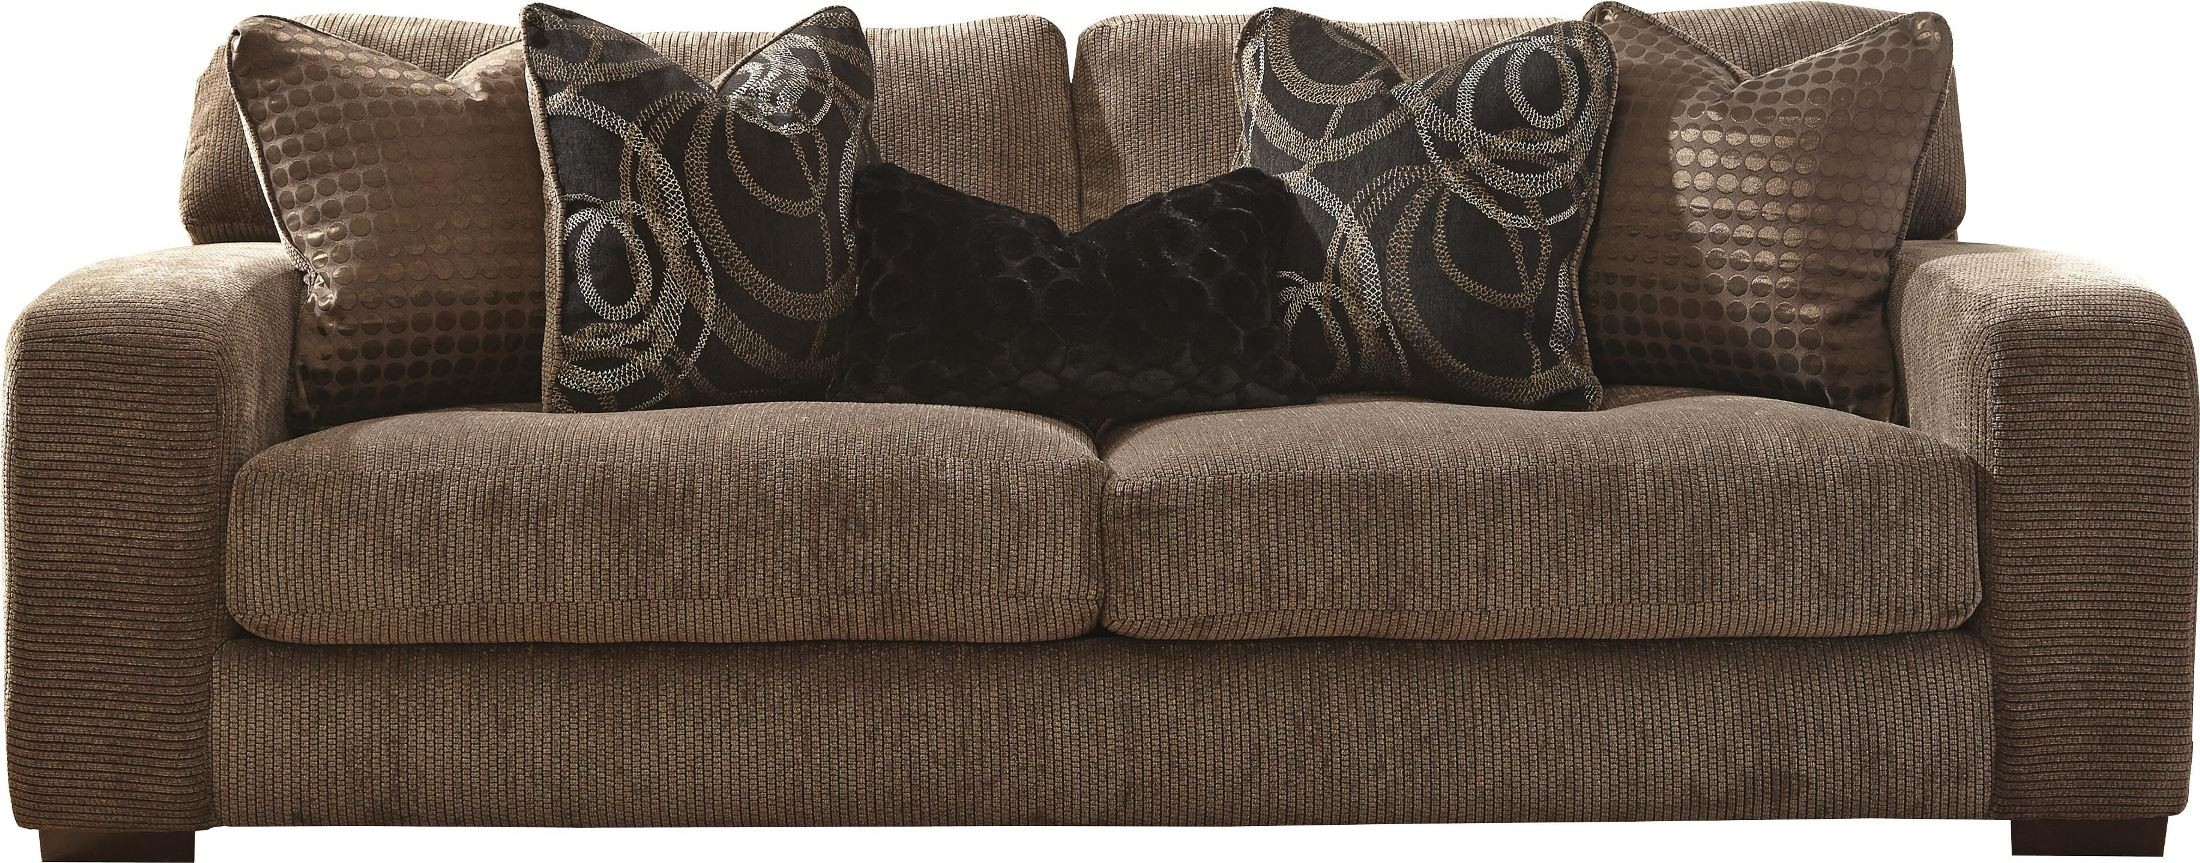 Serena Otter Sofa From Jackson 327603000000000000